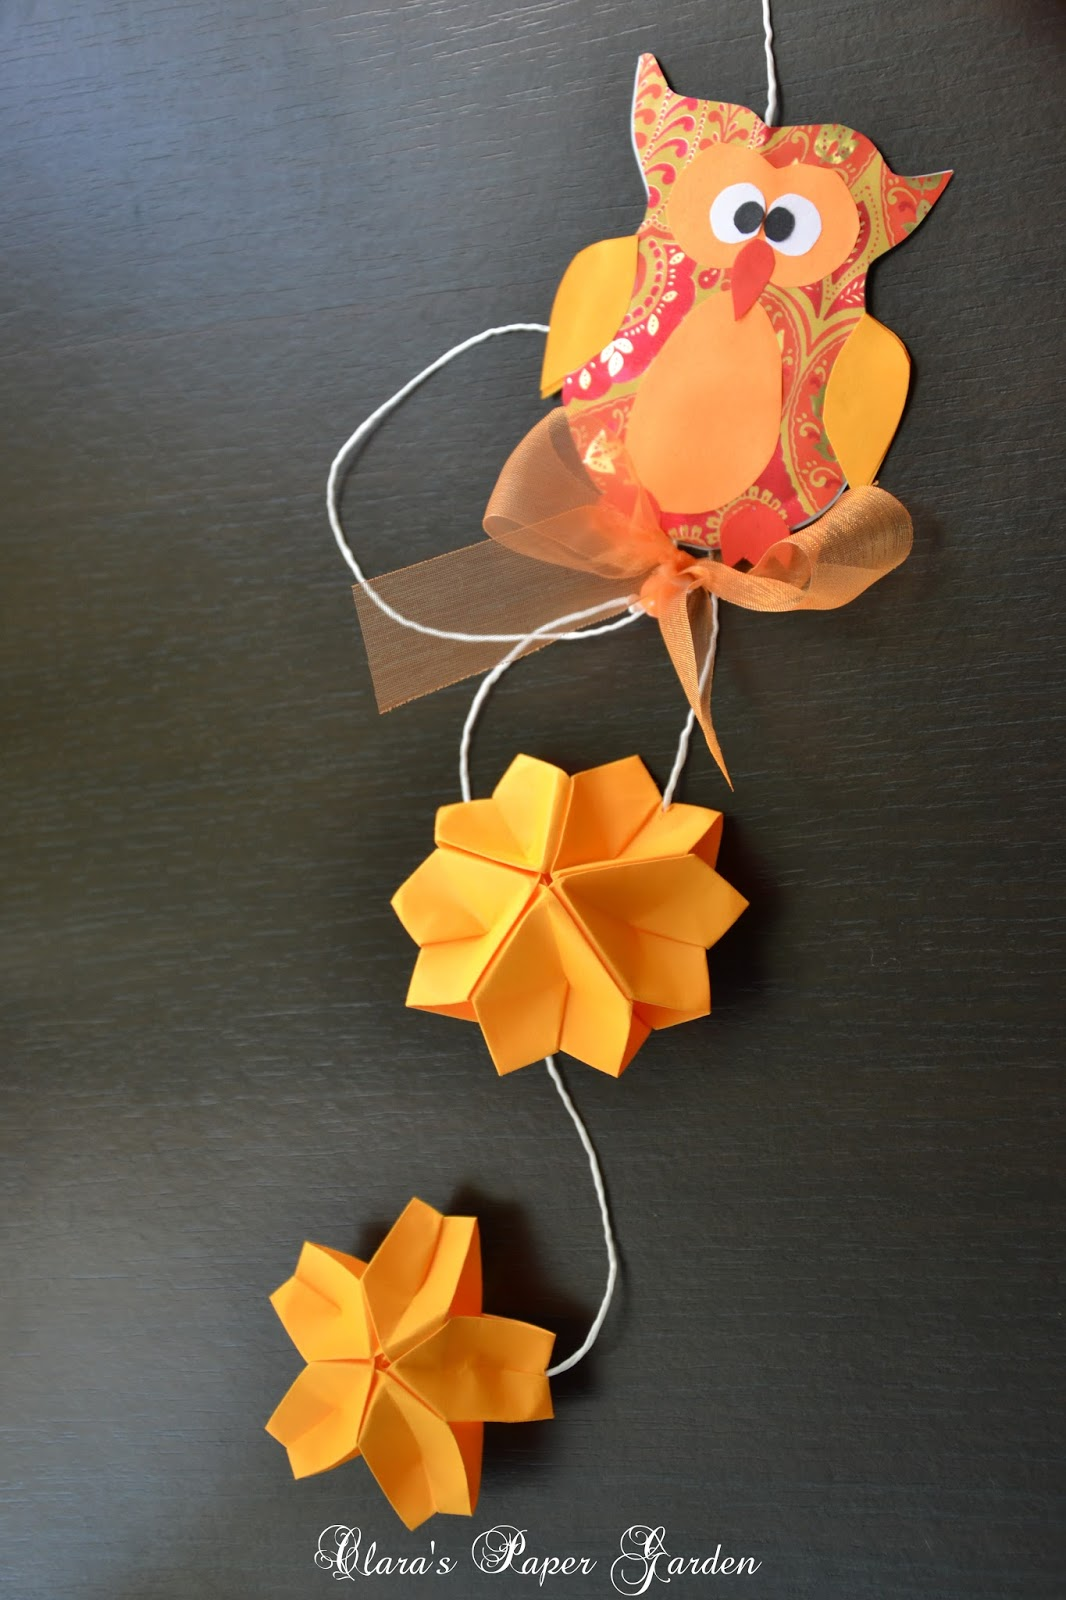 Clara's Paper Garden: Autumn